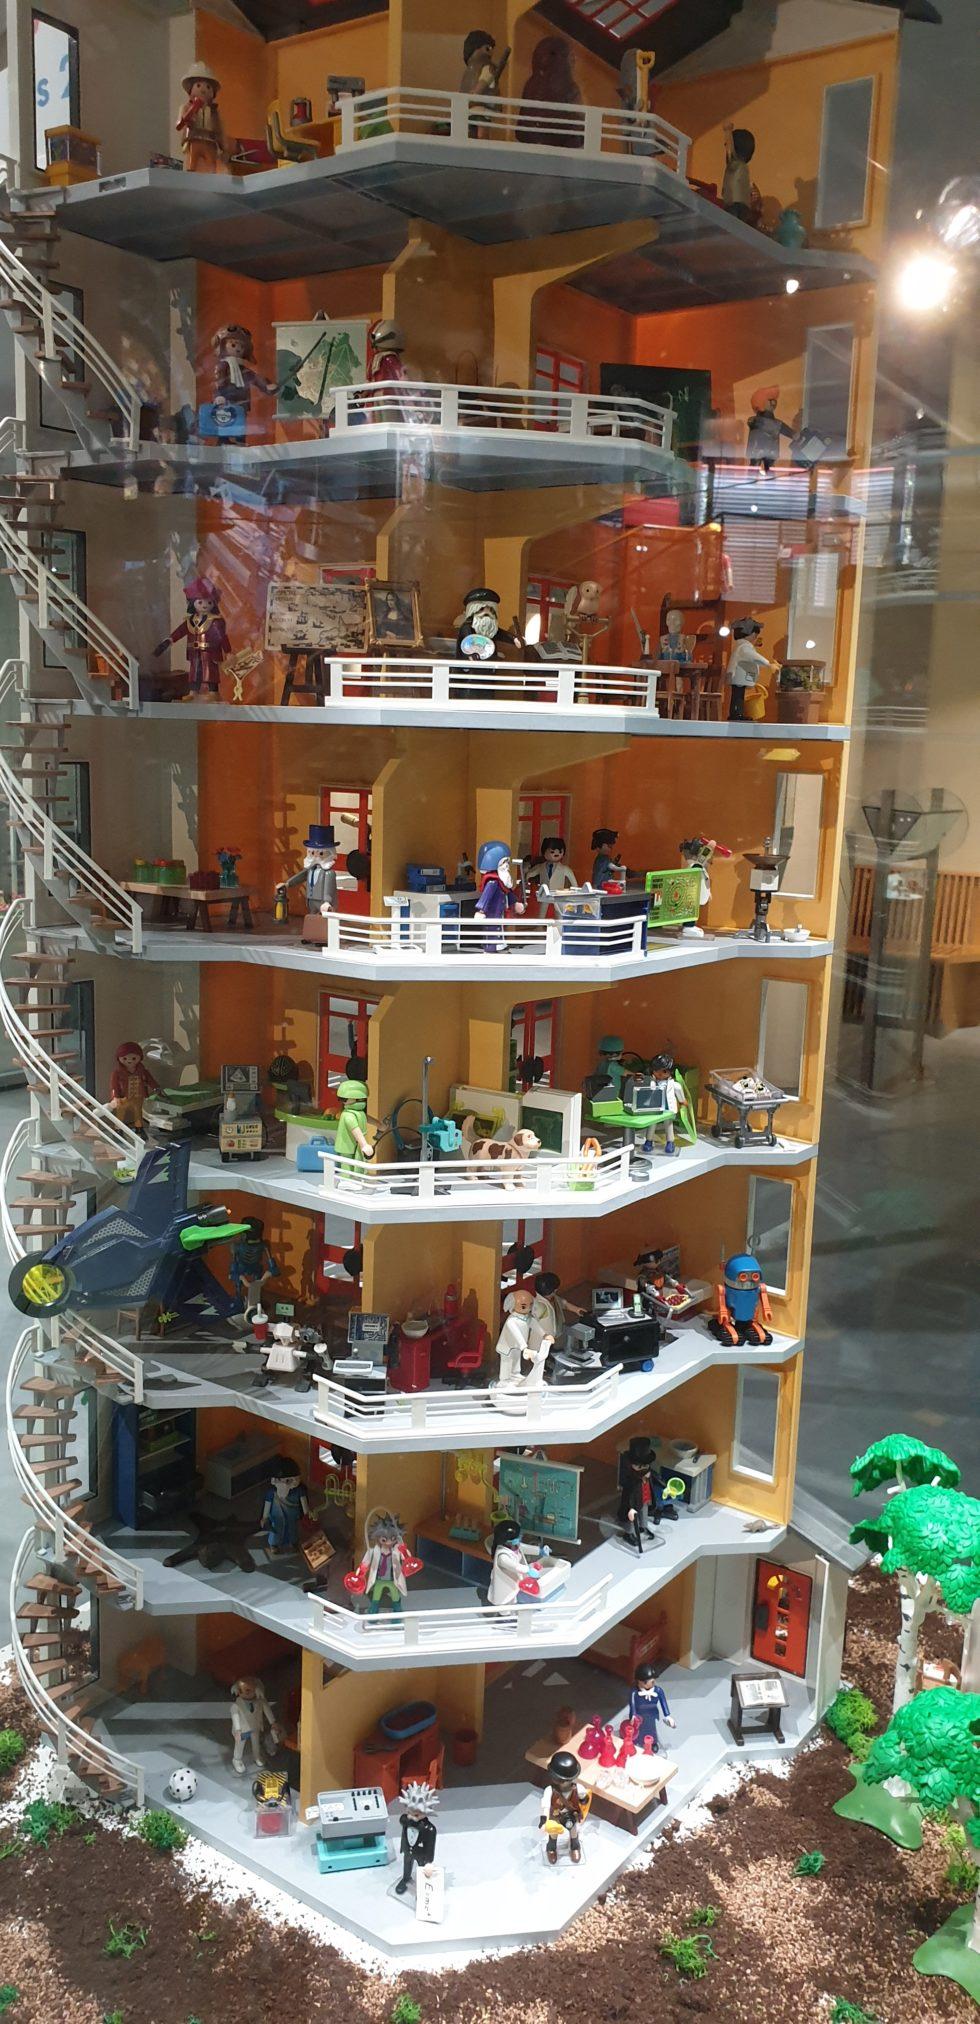 Etagenhaus mit Playmobilfiguren